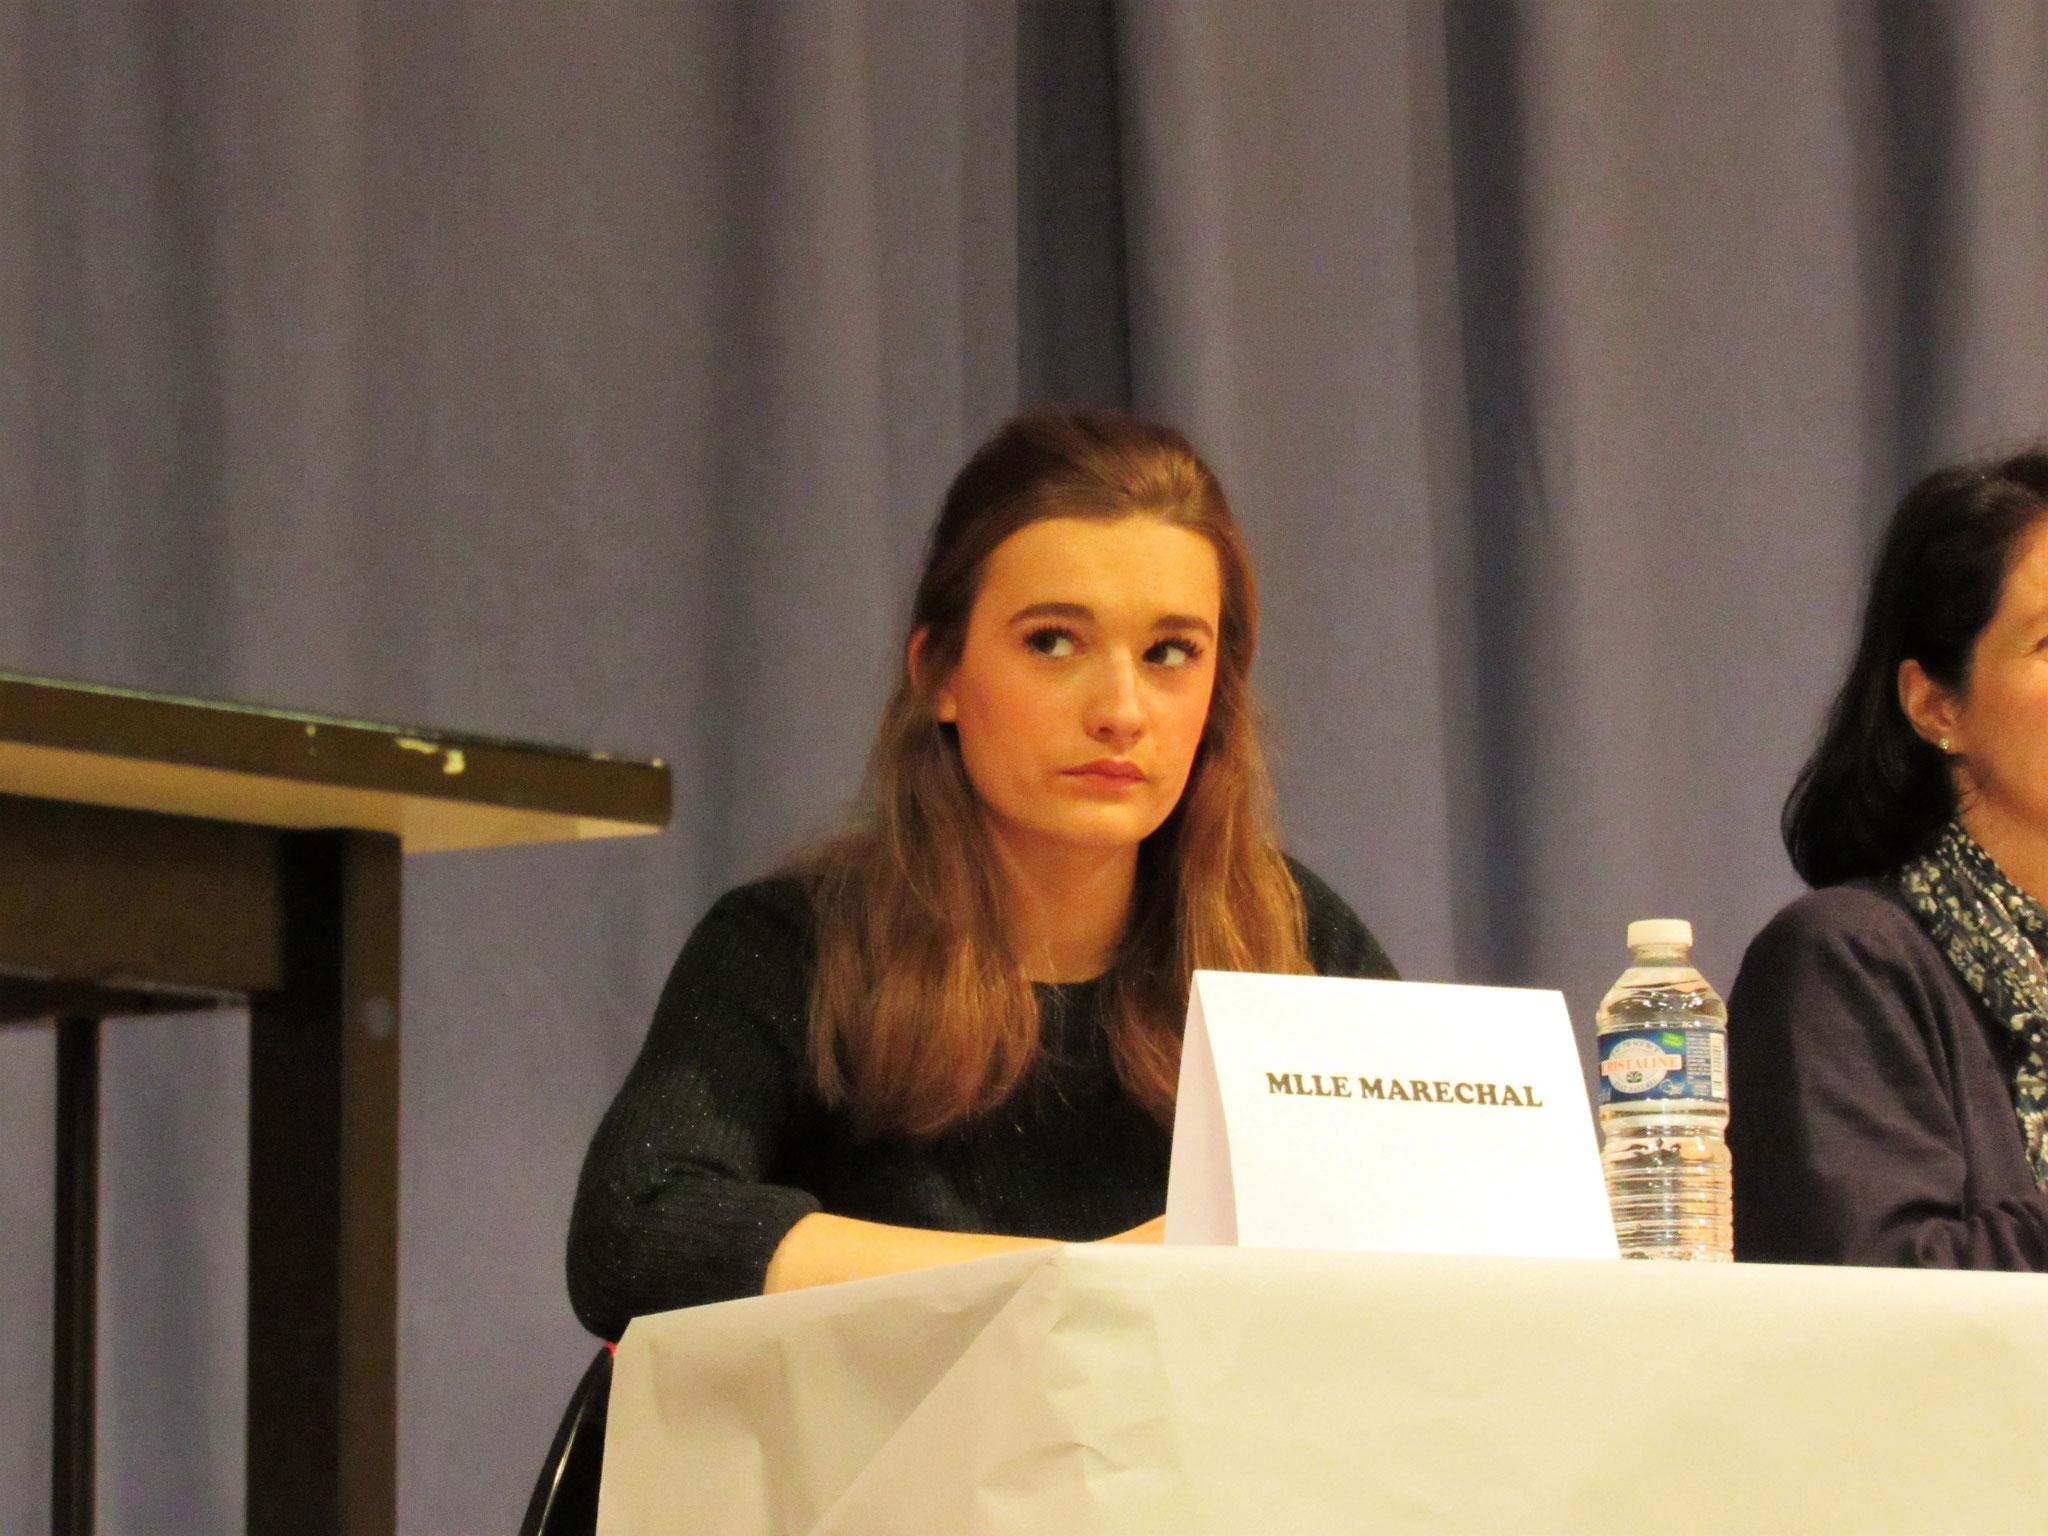 Alyette, la Présidente du Jury